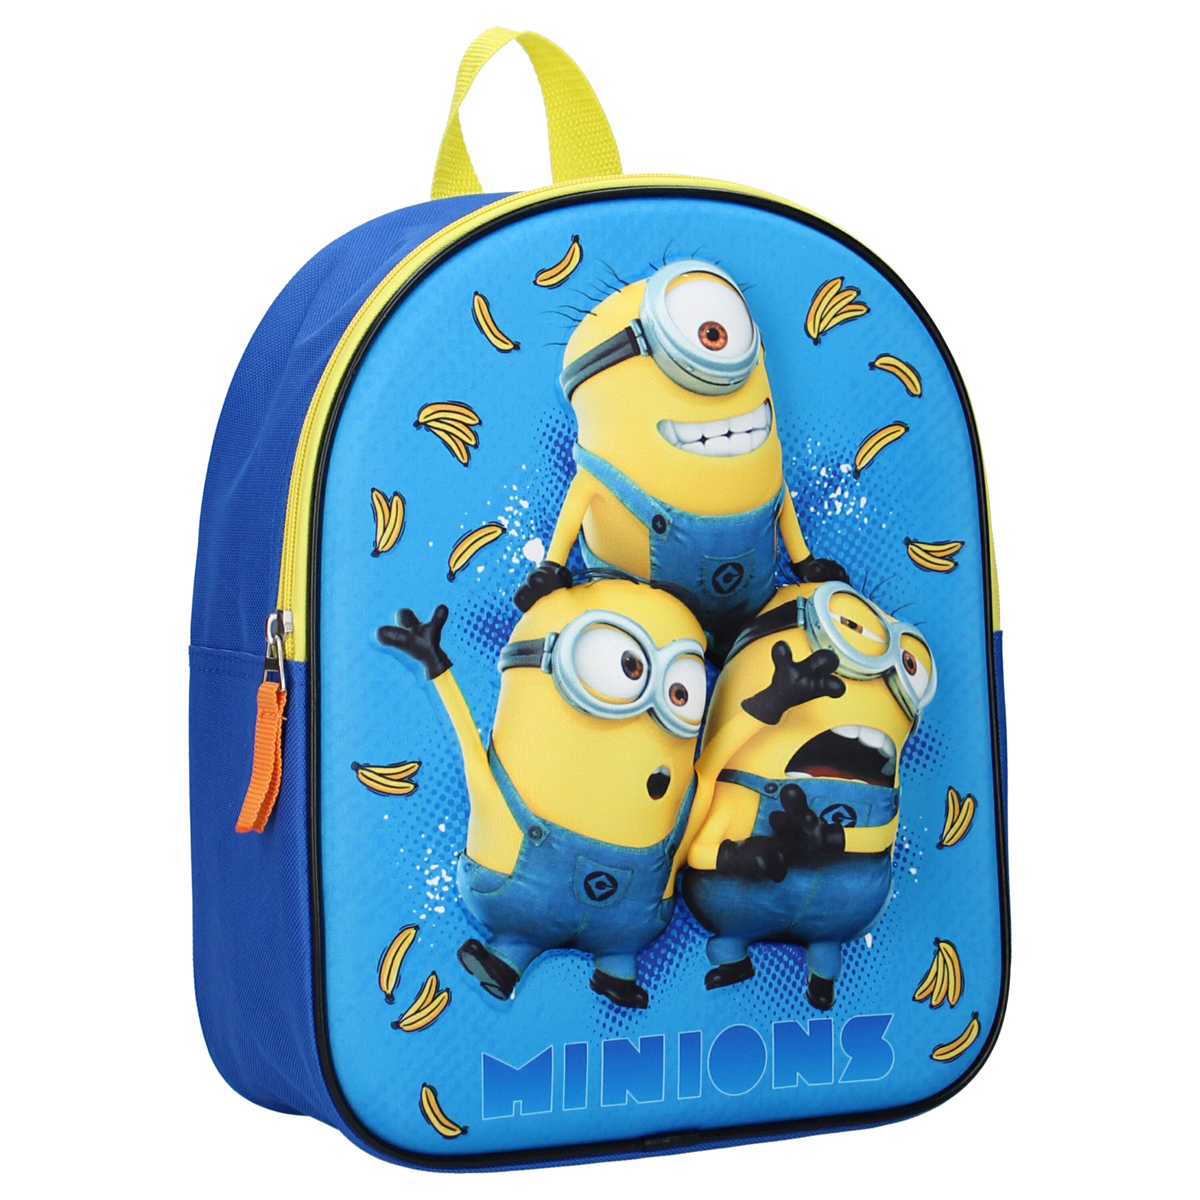 Sac à Dos 3D \'Minions\' bleu jaune - 31x25x10 cm - [A0598]